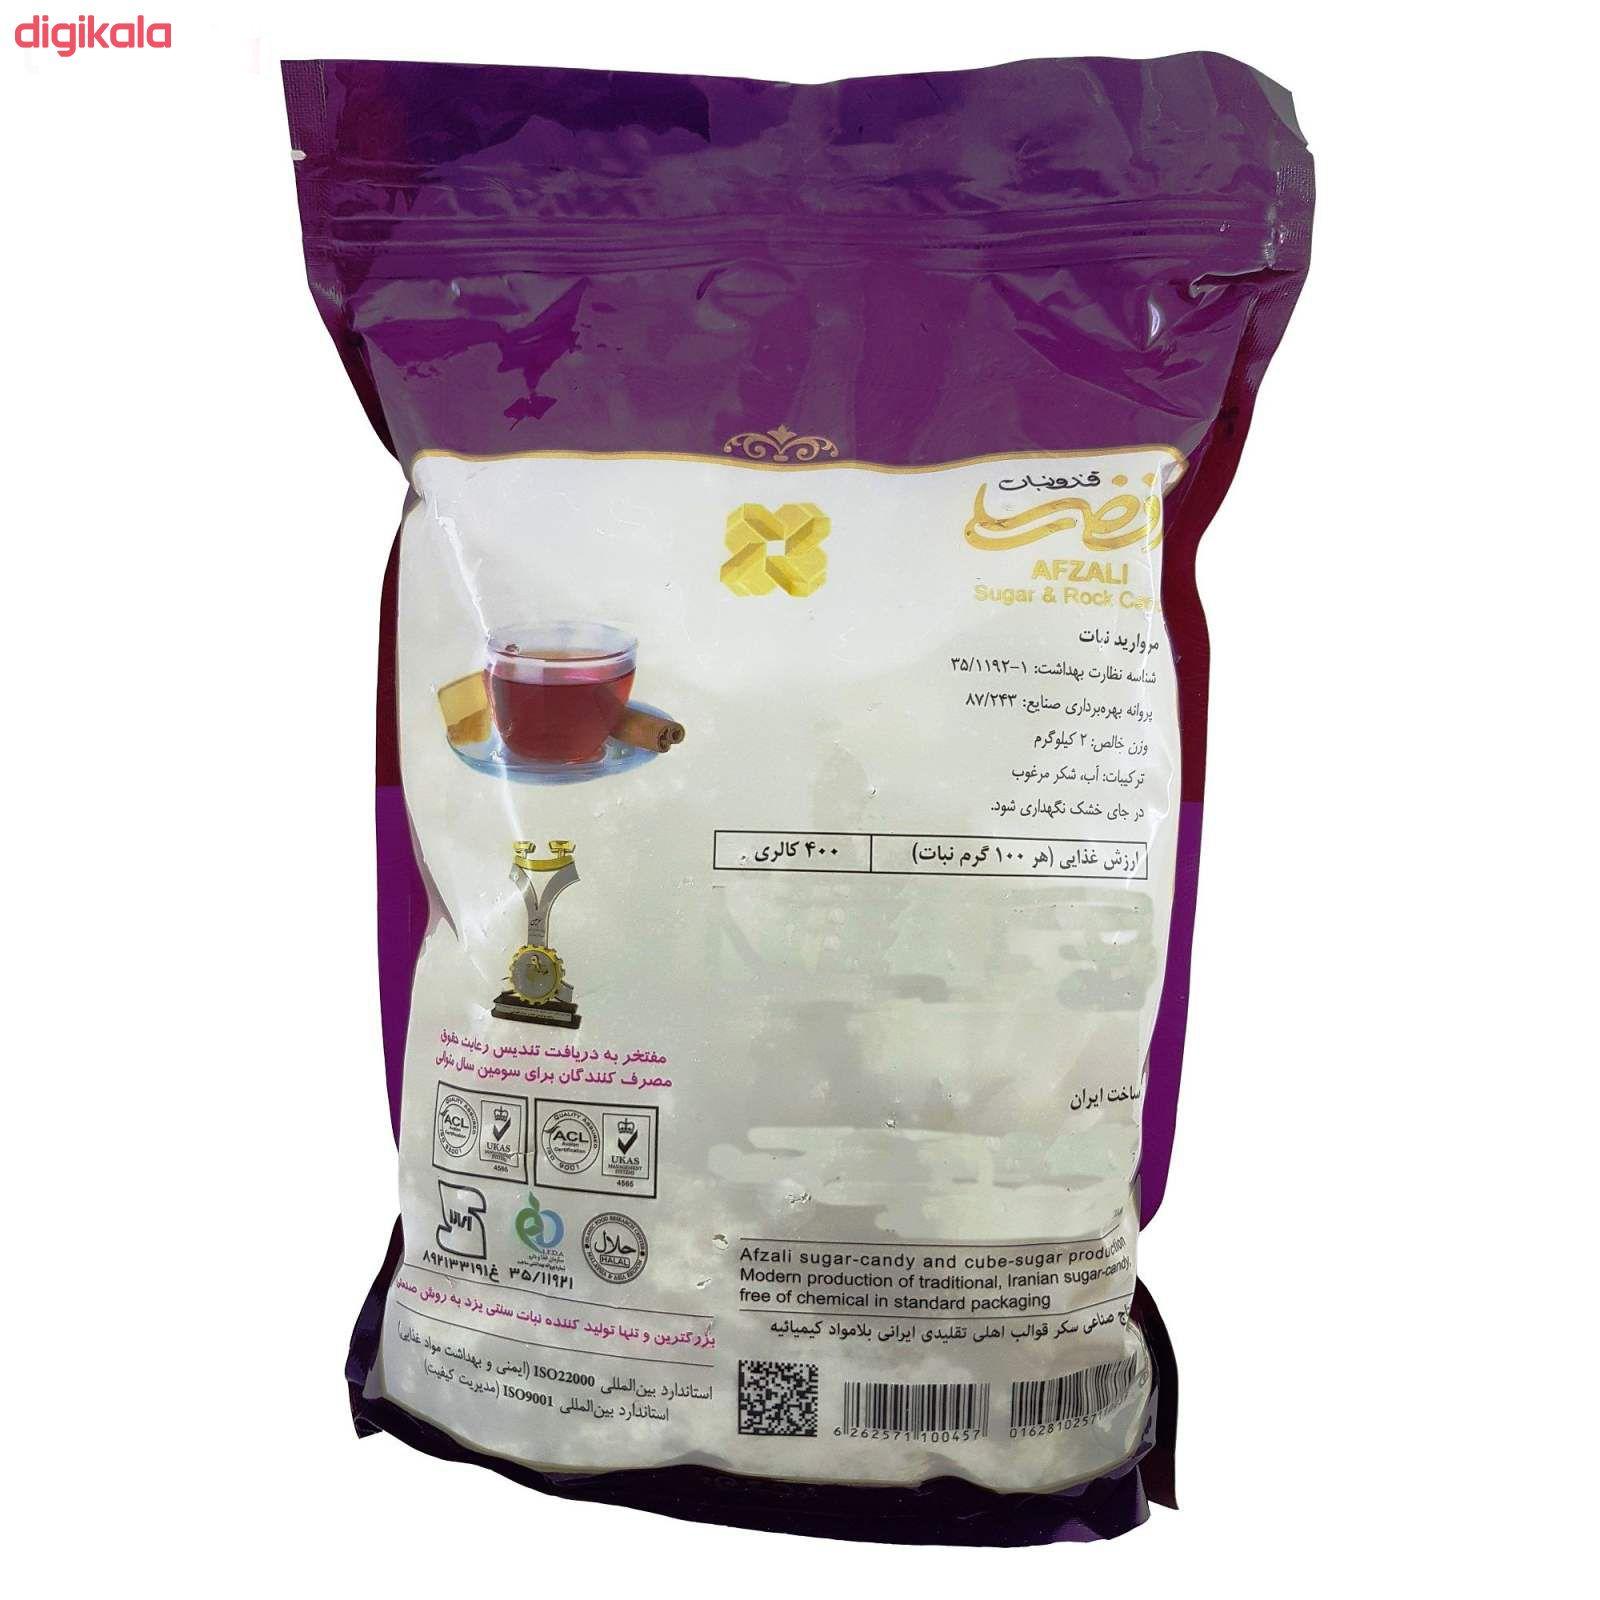 مروارید نبات سنتی یزد افضلی - 2 کیلوگرم main 1 1